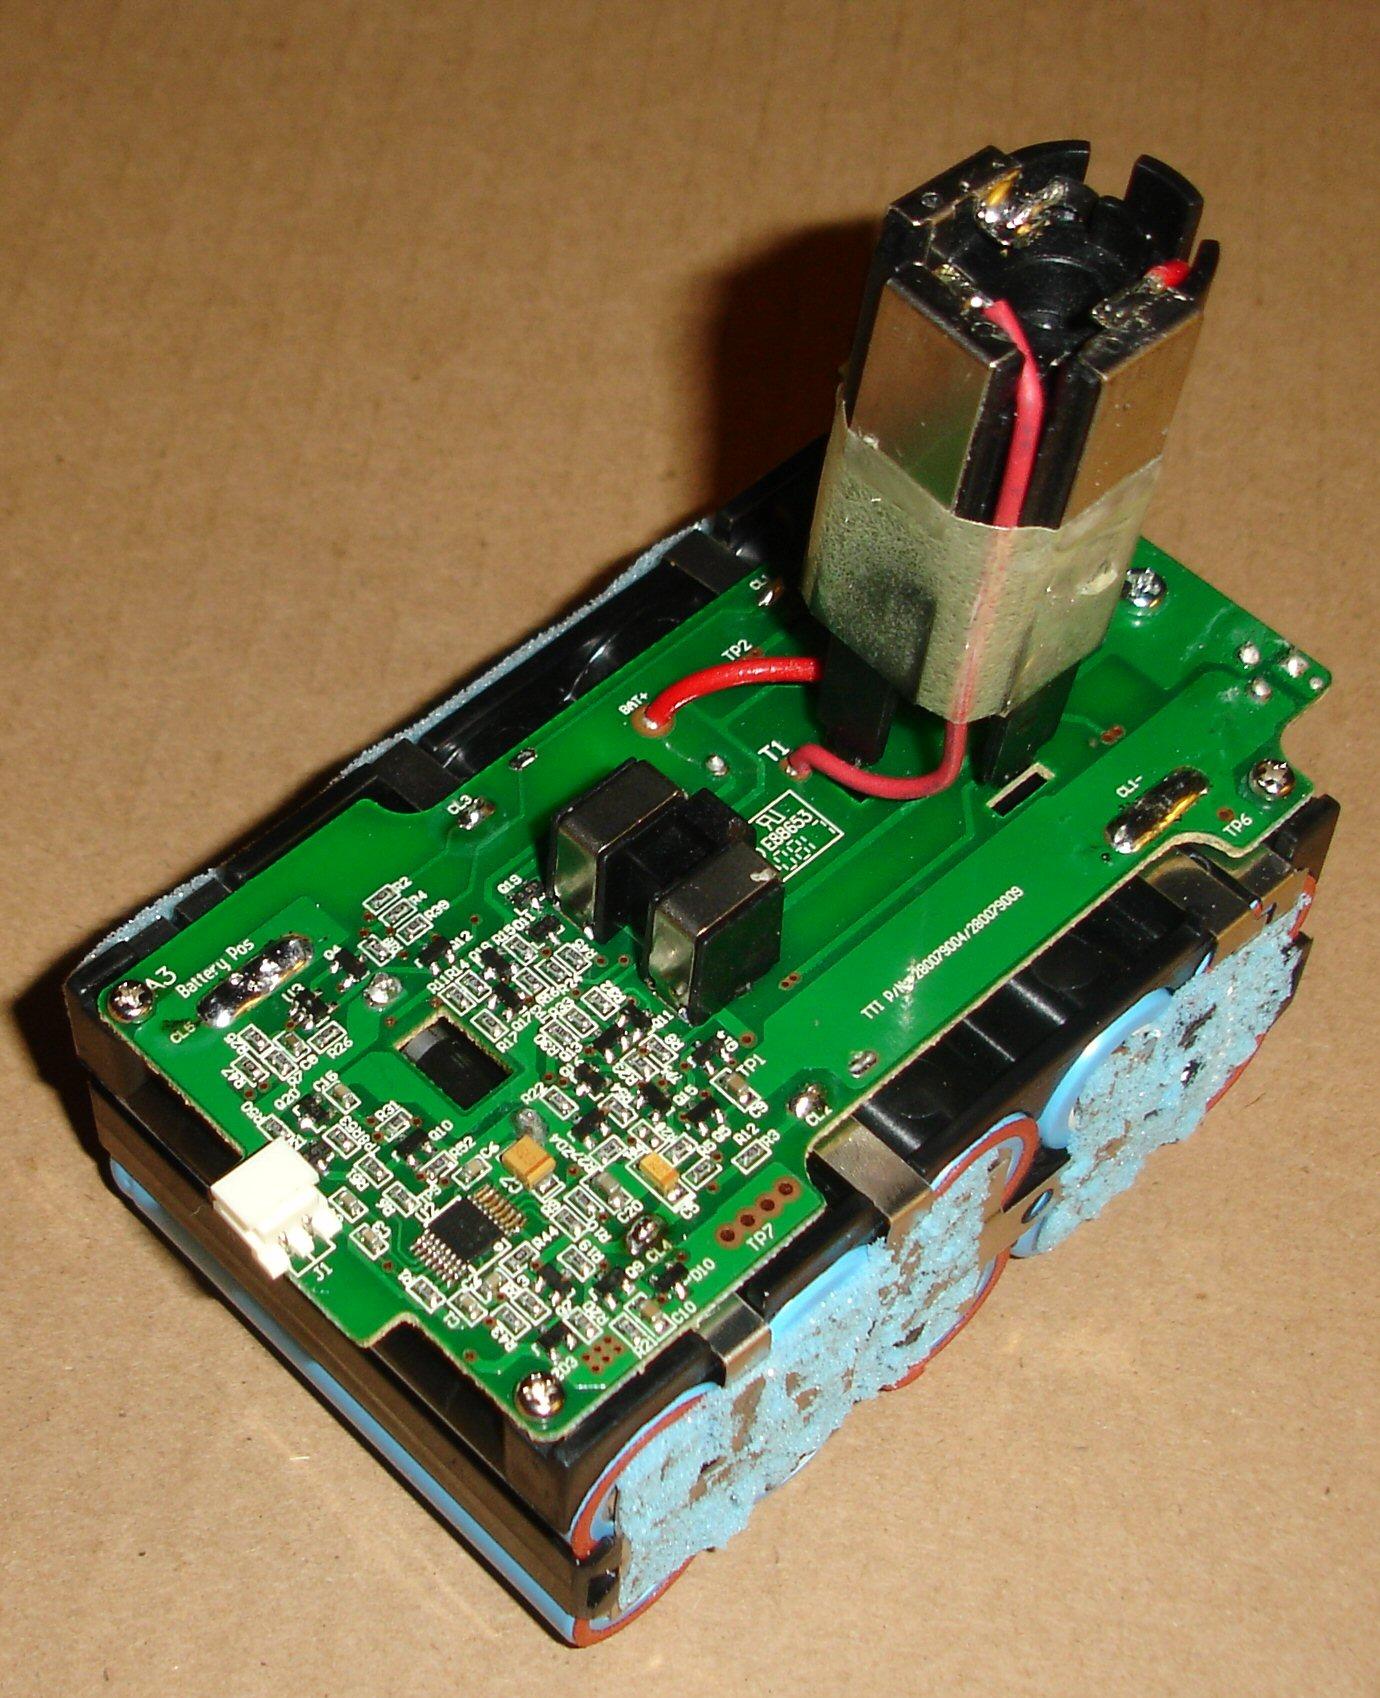 toolboy's Corner: Rebuilding Ryobi 18v Batteries